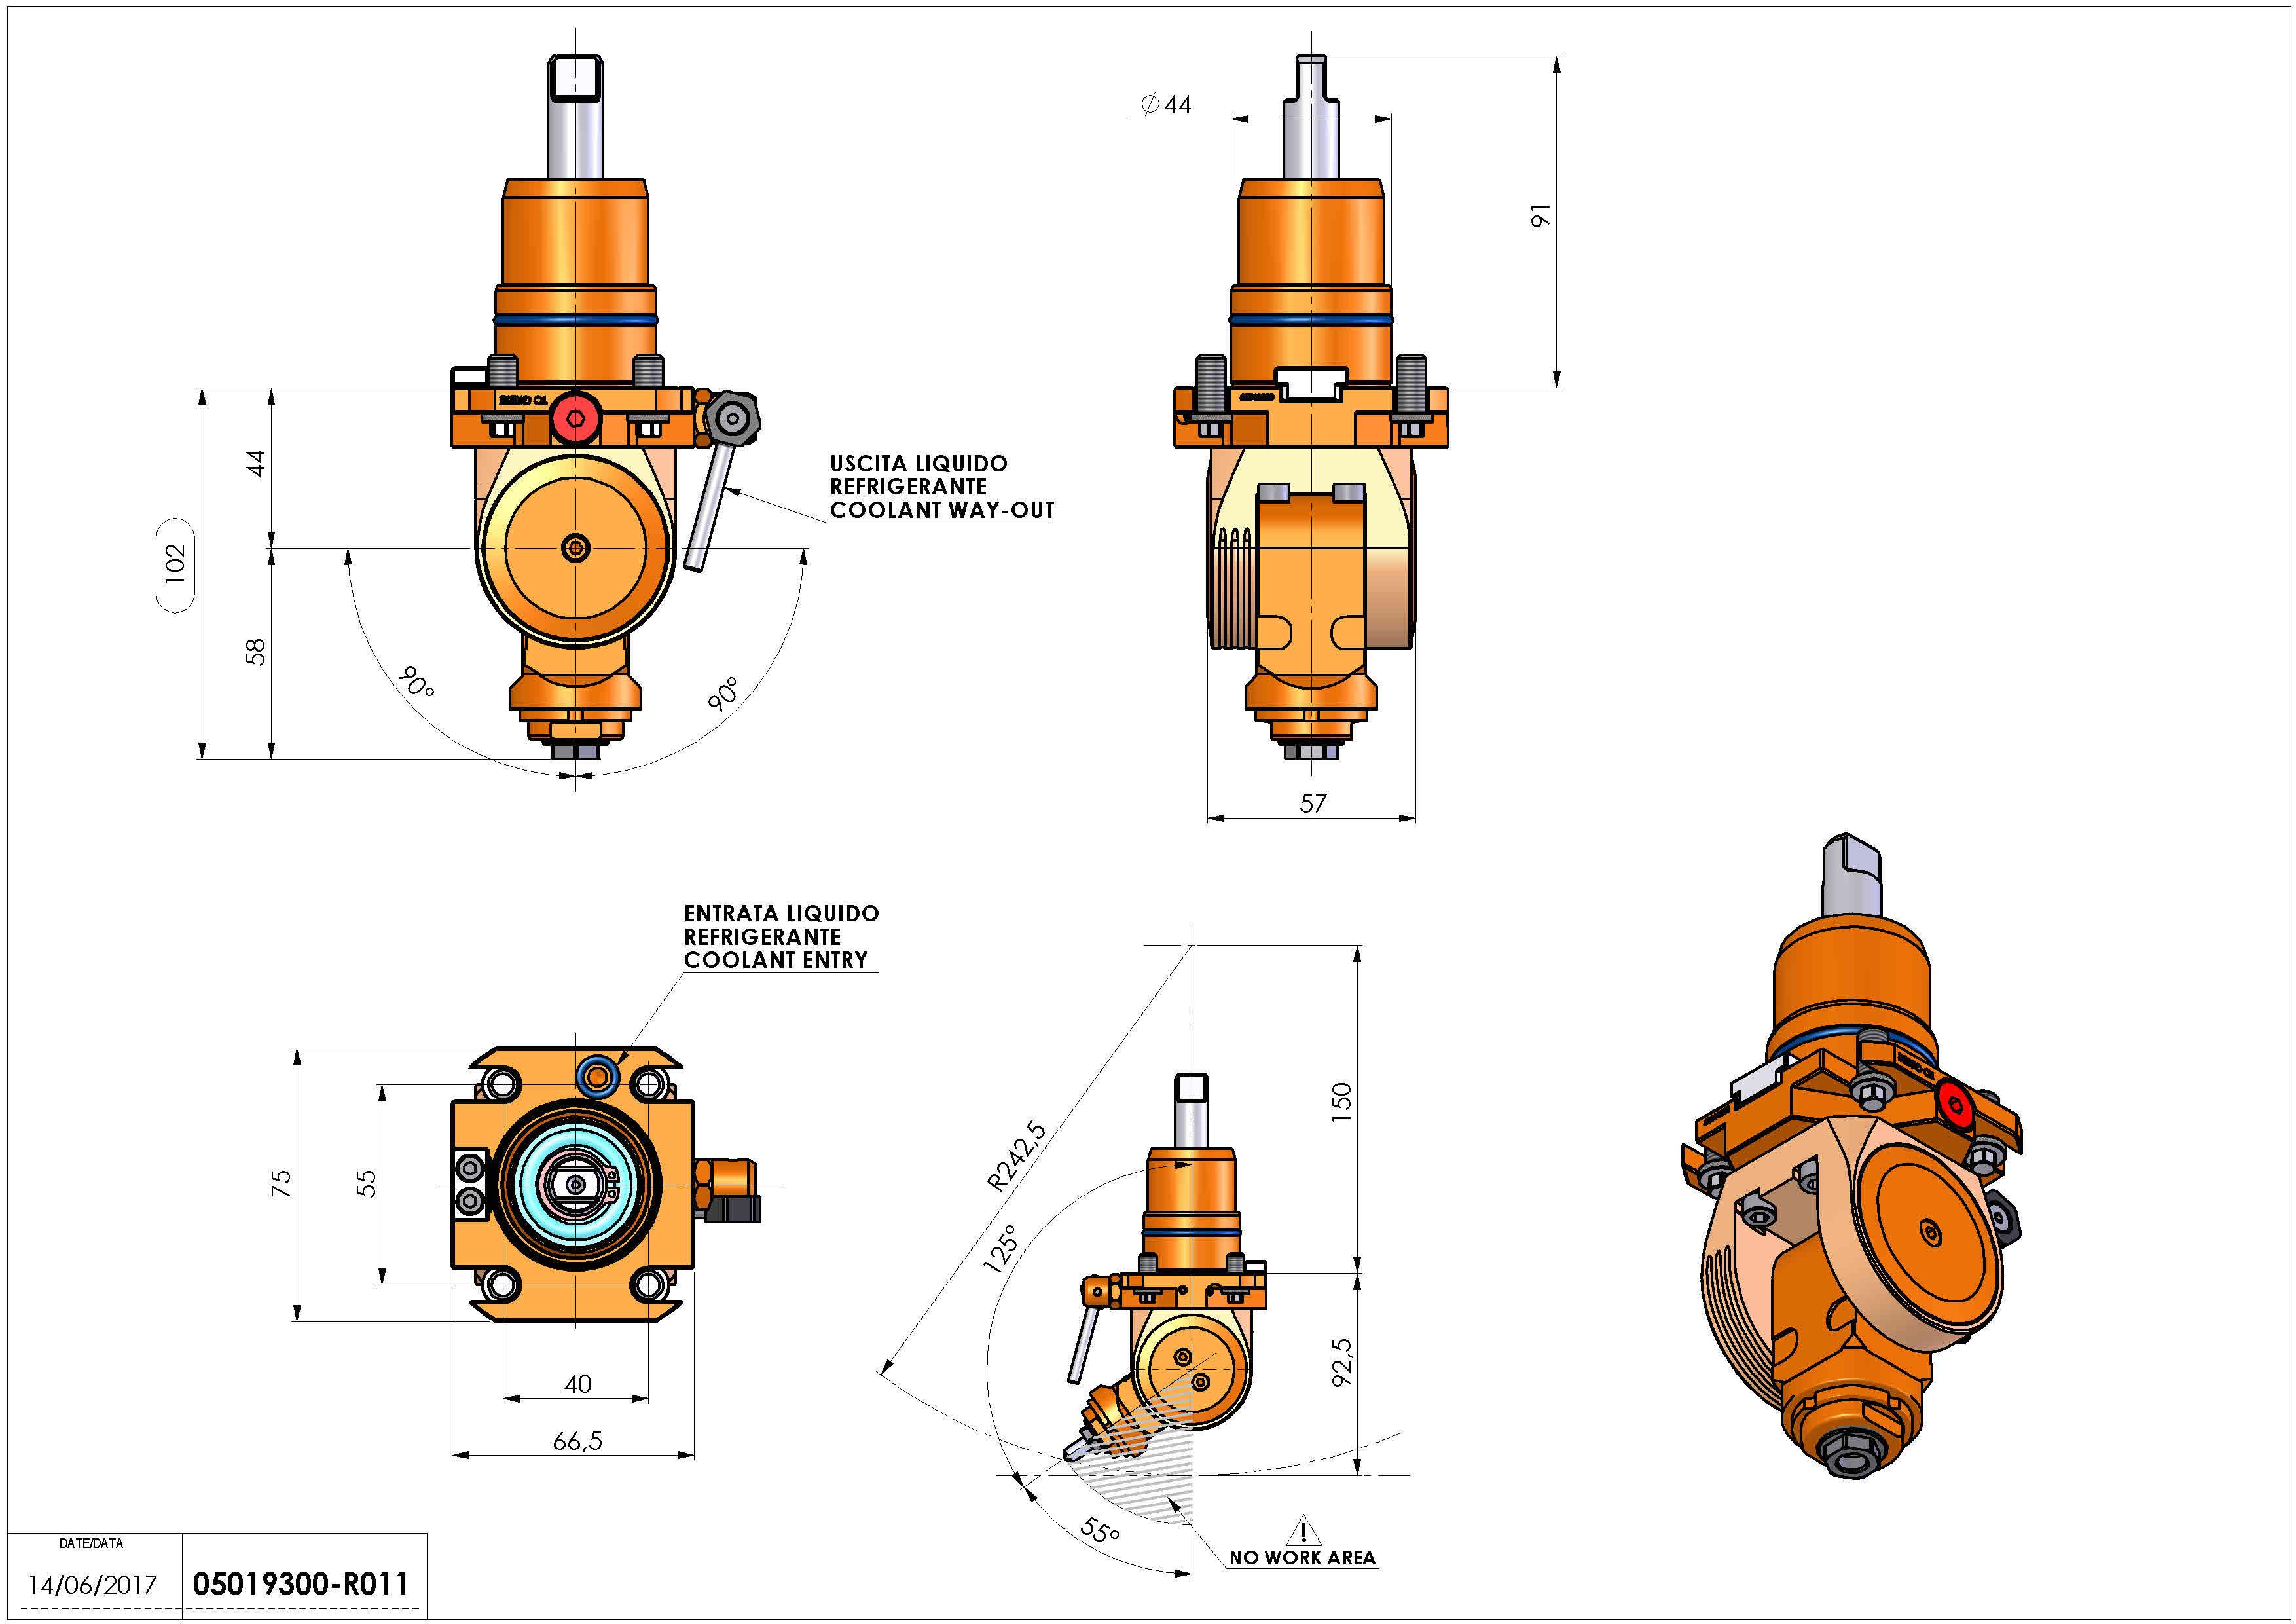 Technical image - LT-T D44 ER11F H44-100.